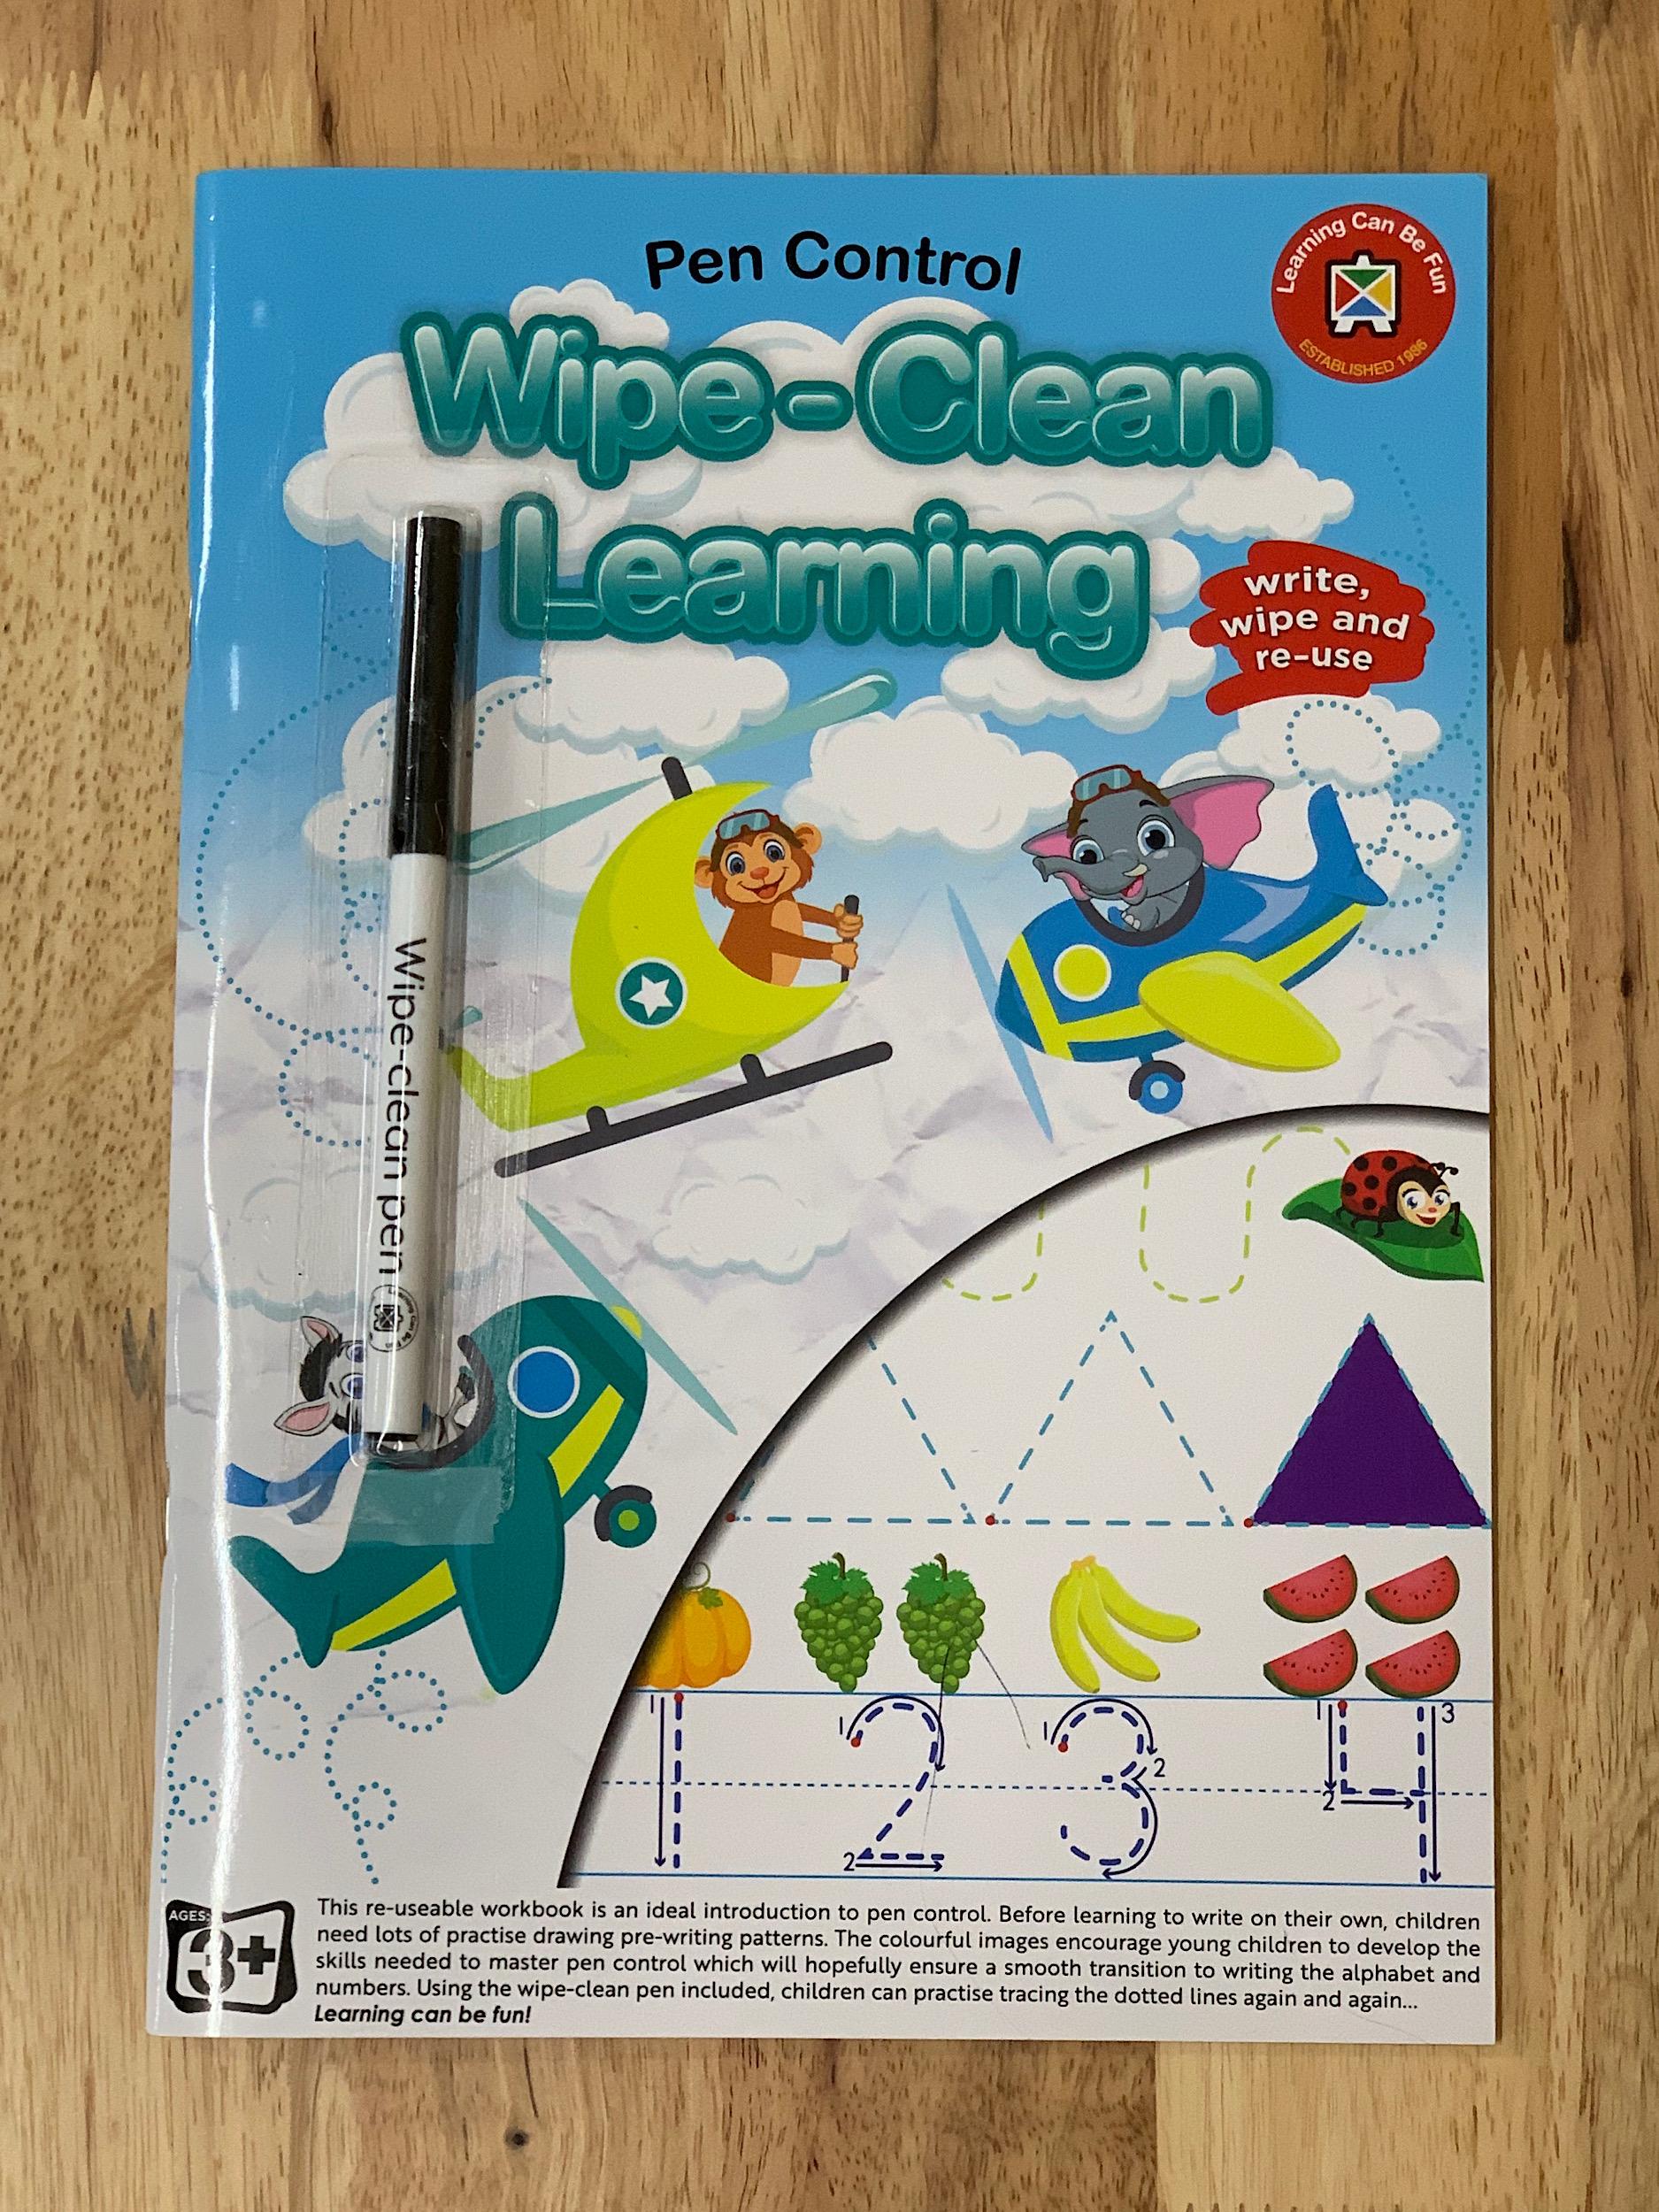 Wipe Clean Learning Pen Control